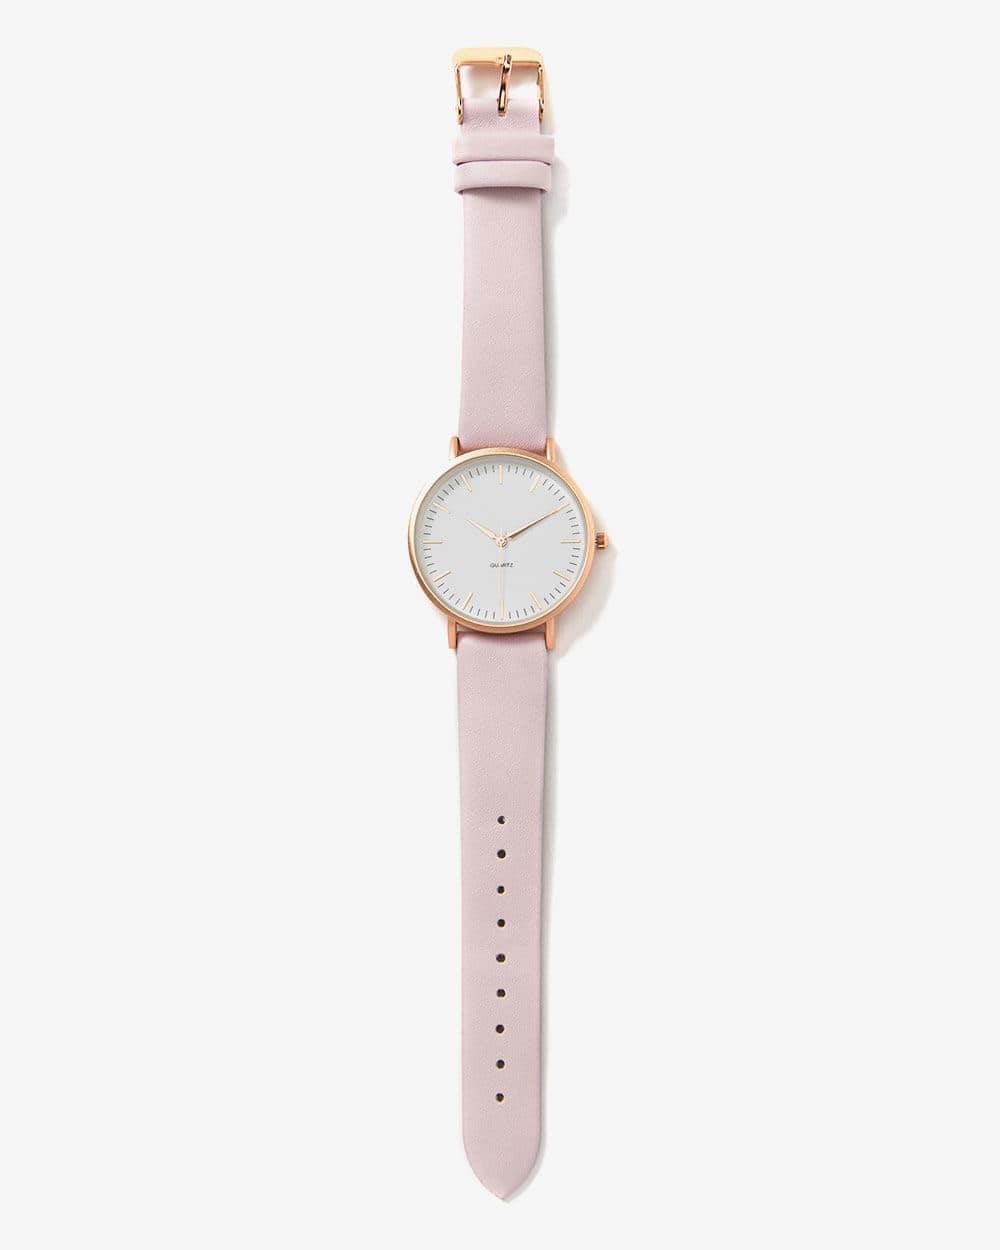 Montre-bracelet rose et dorée